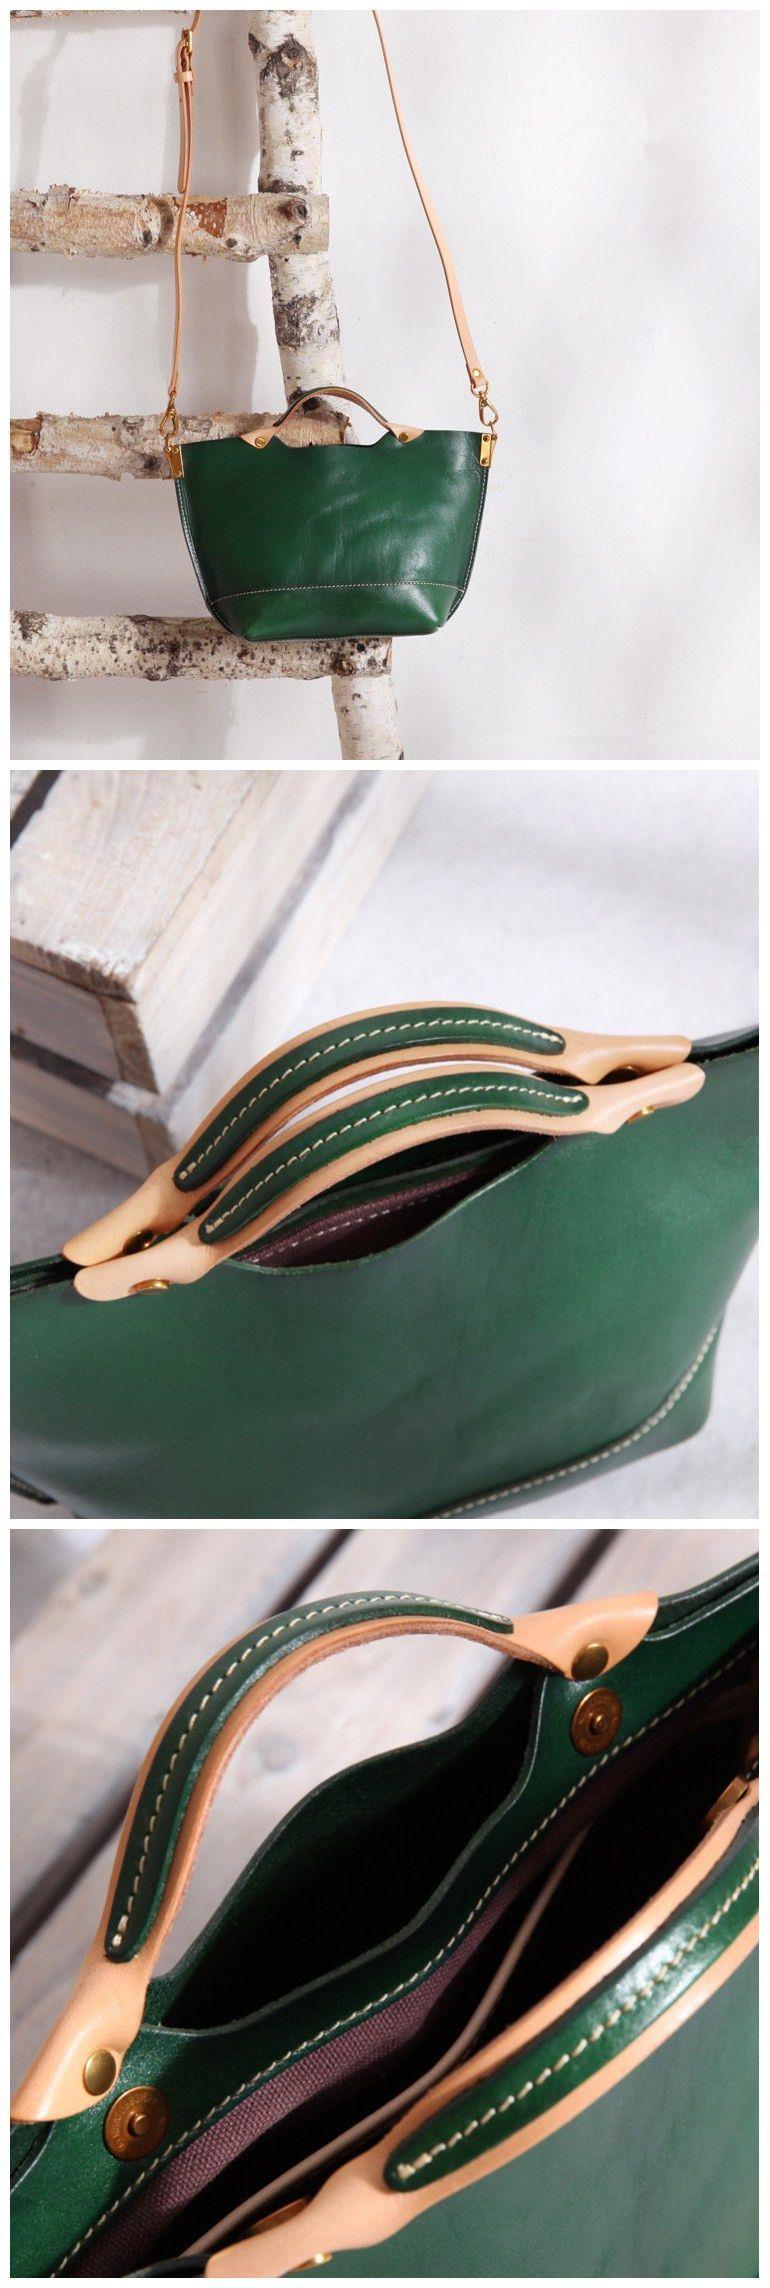 Ladies Handbags Full Grain Leather Handmade Cross body Bag Designer Handbags CF37 Ladies Handbags Full Grain Leather Handmade Cross body Bag Designer Handbags CF37